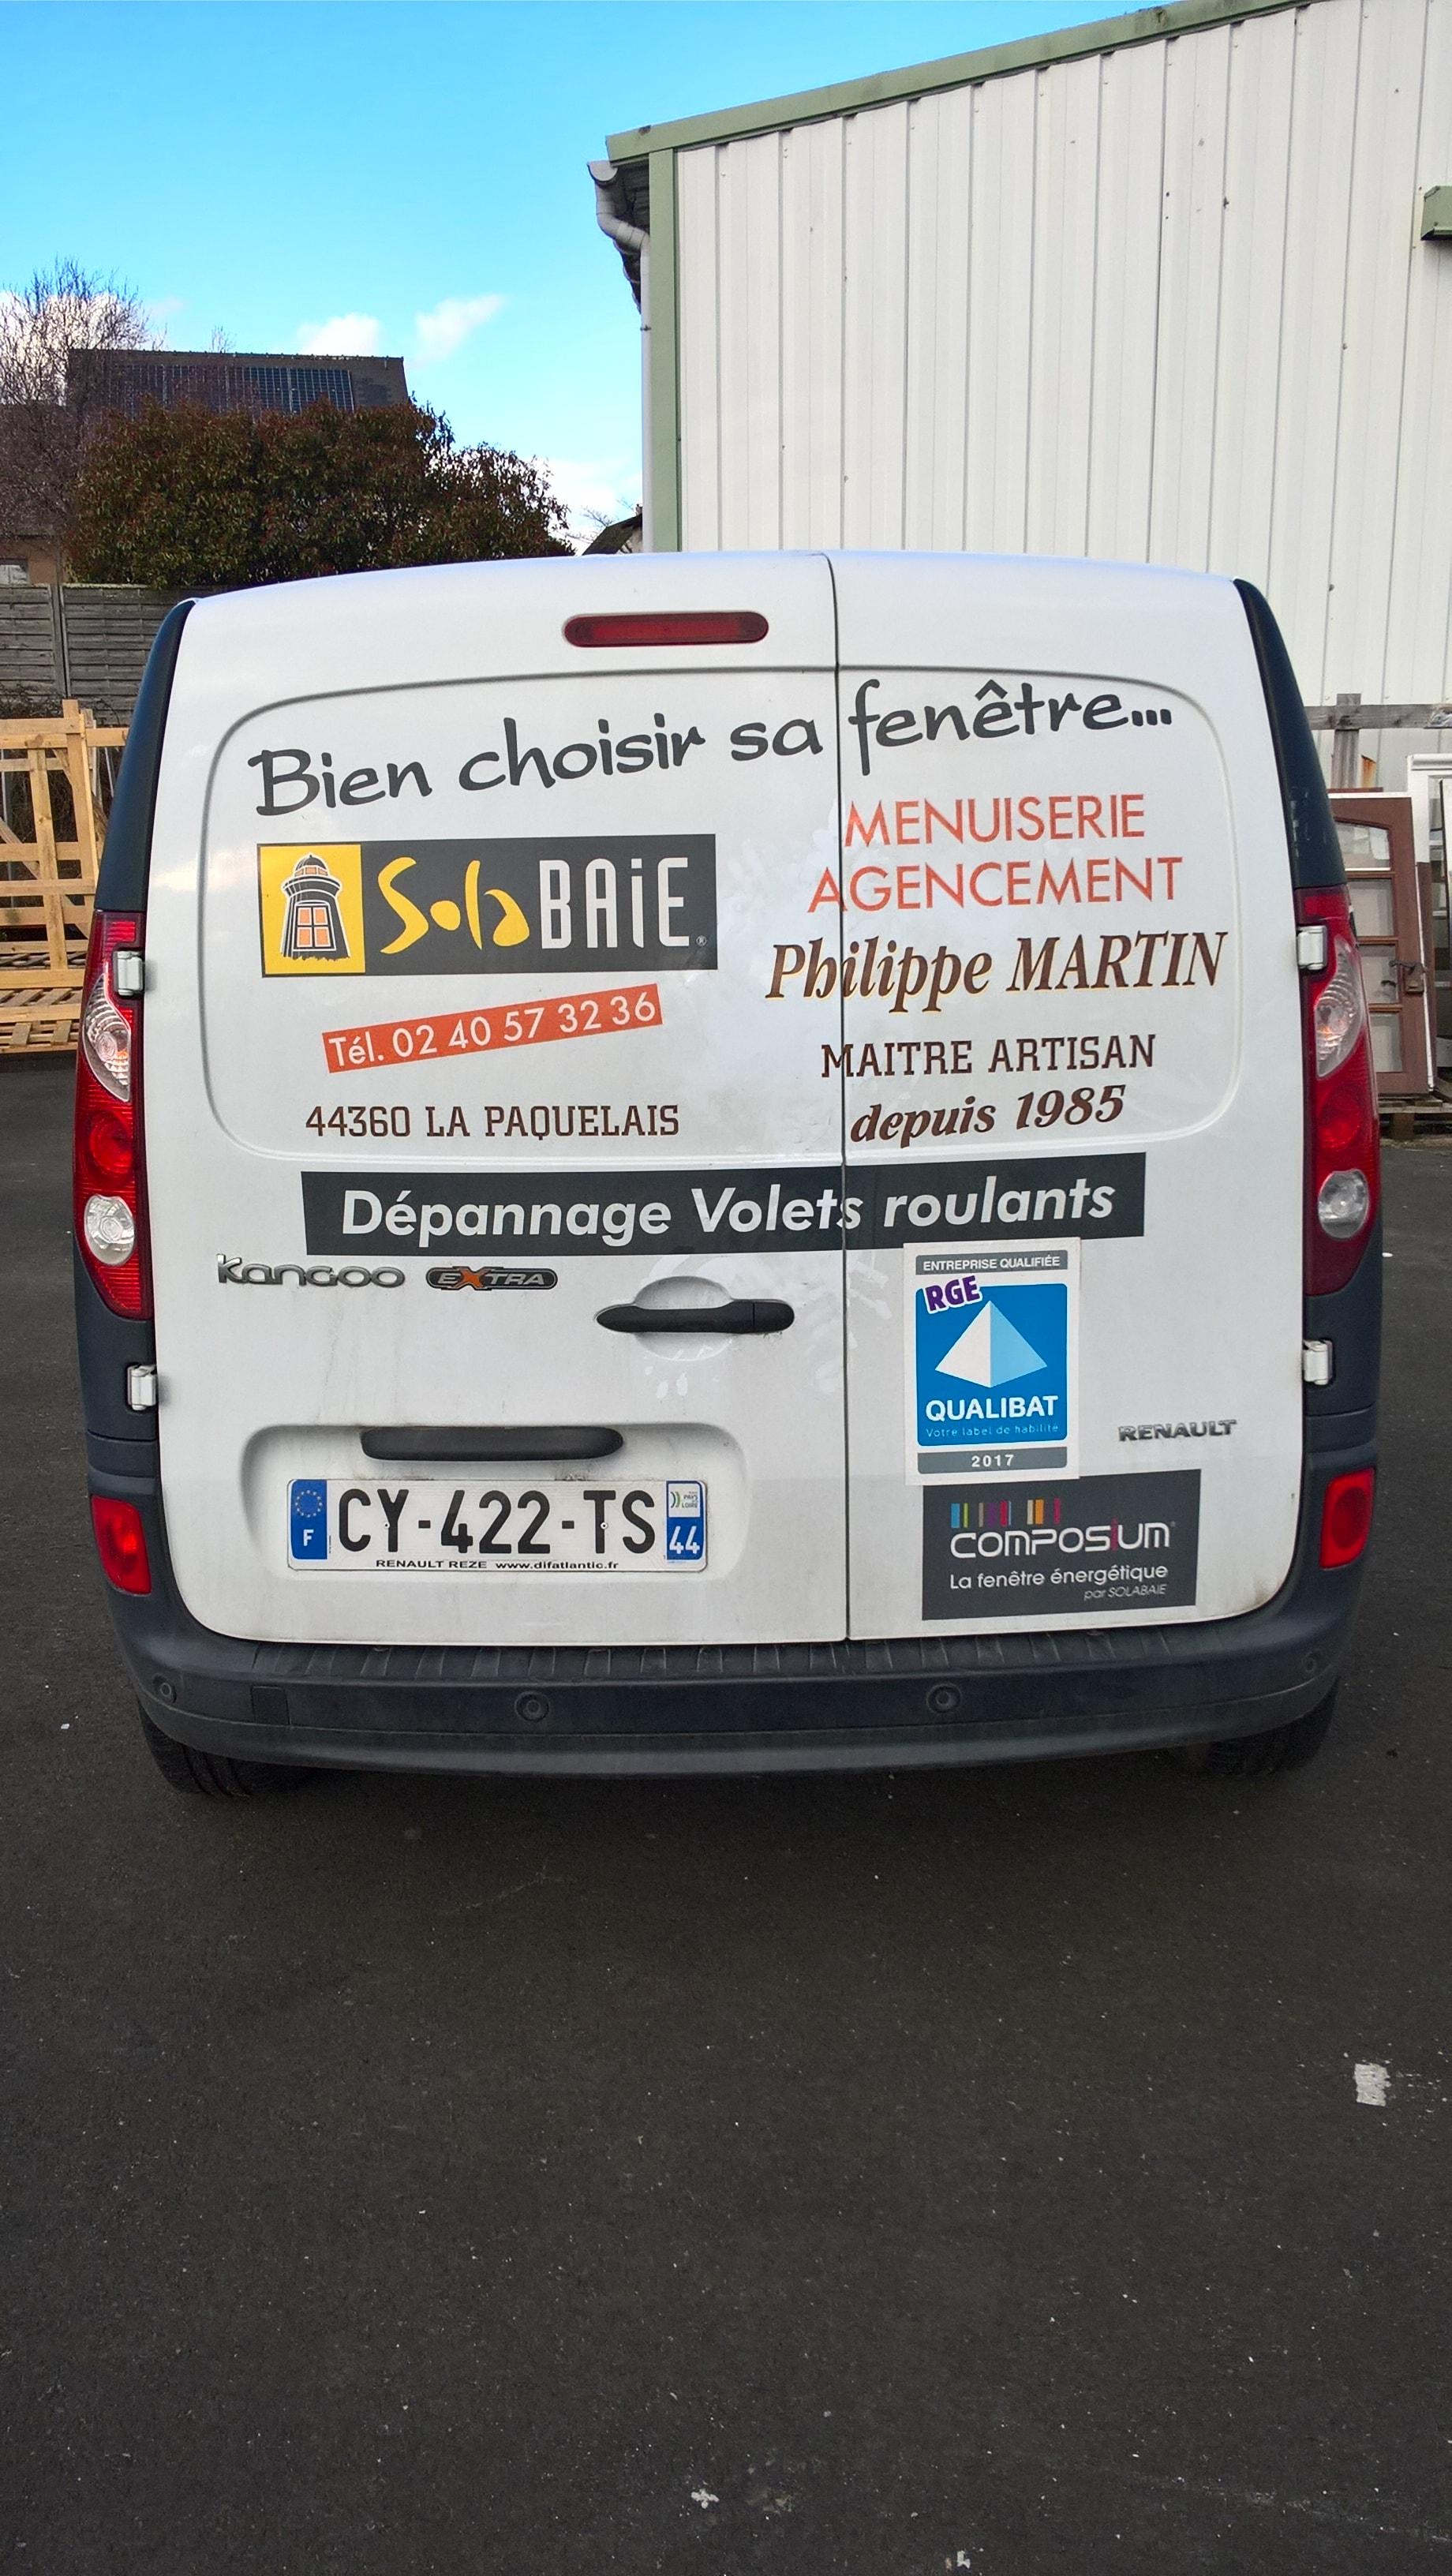 Trouver Un Artisan Menuisier camion-artisan-menuisier-solabaie-martin-philippe-loire